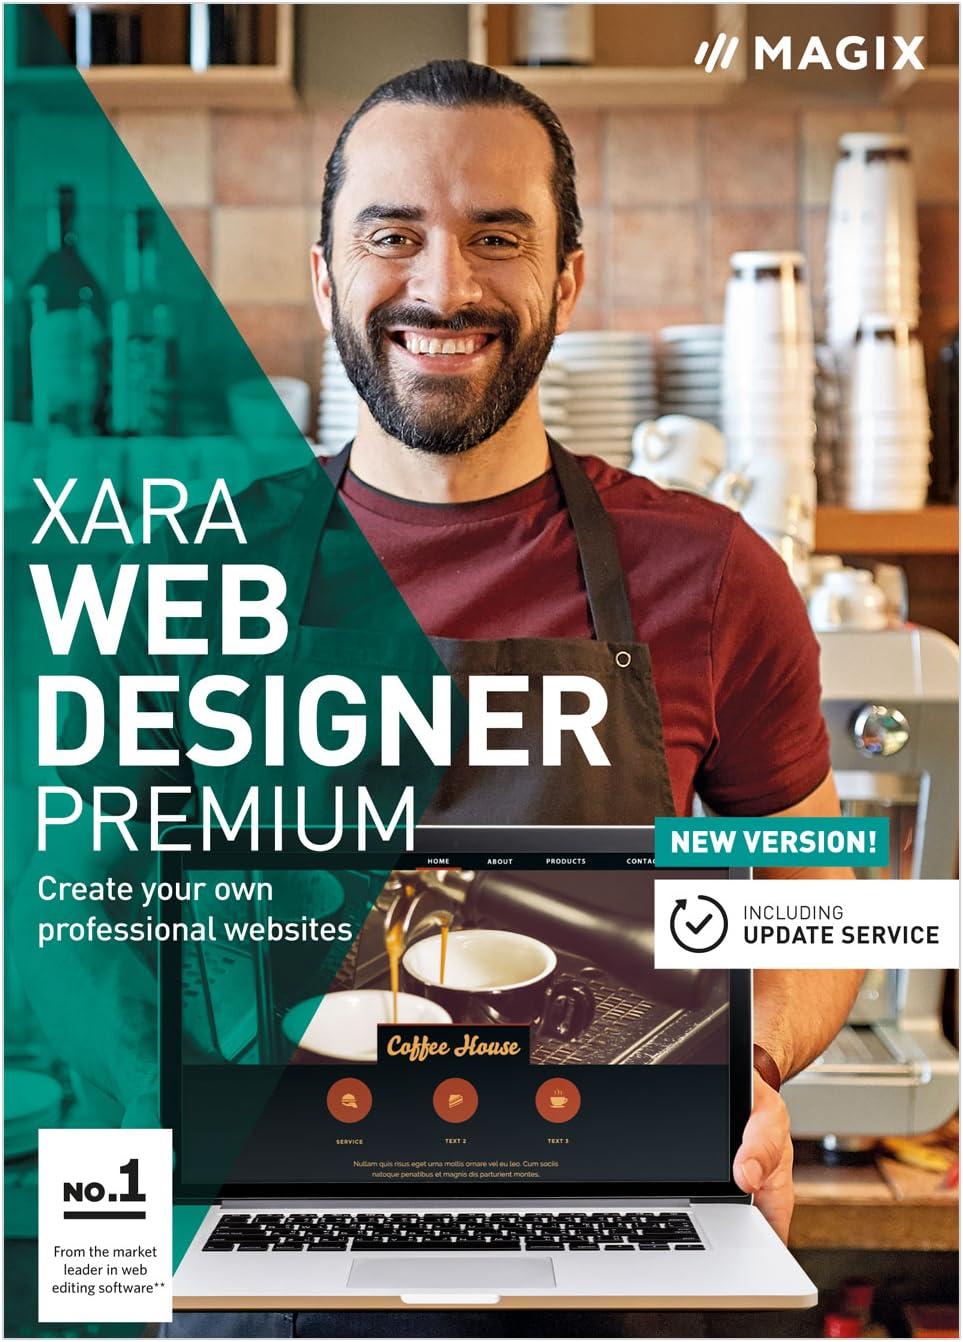 Amazon Com Xara Web Designer Premium 15 Create Your Own Professional Websites Download Software